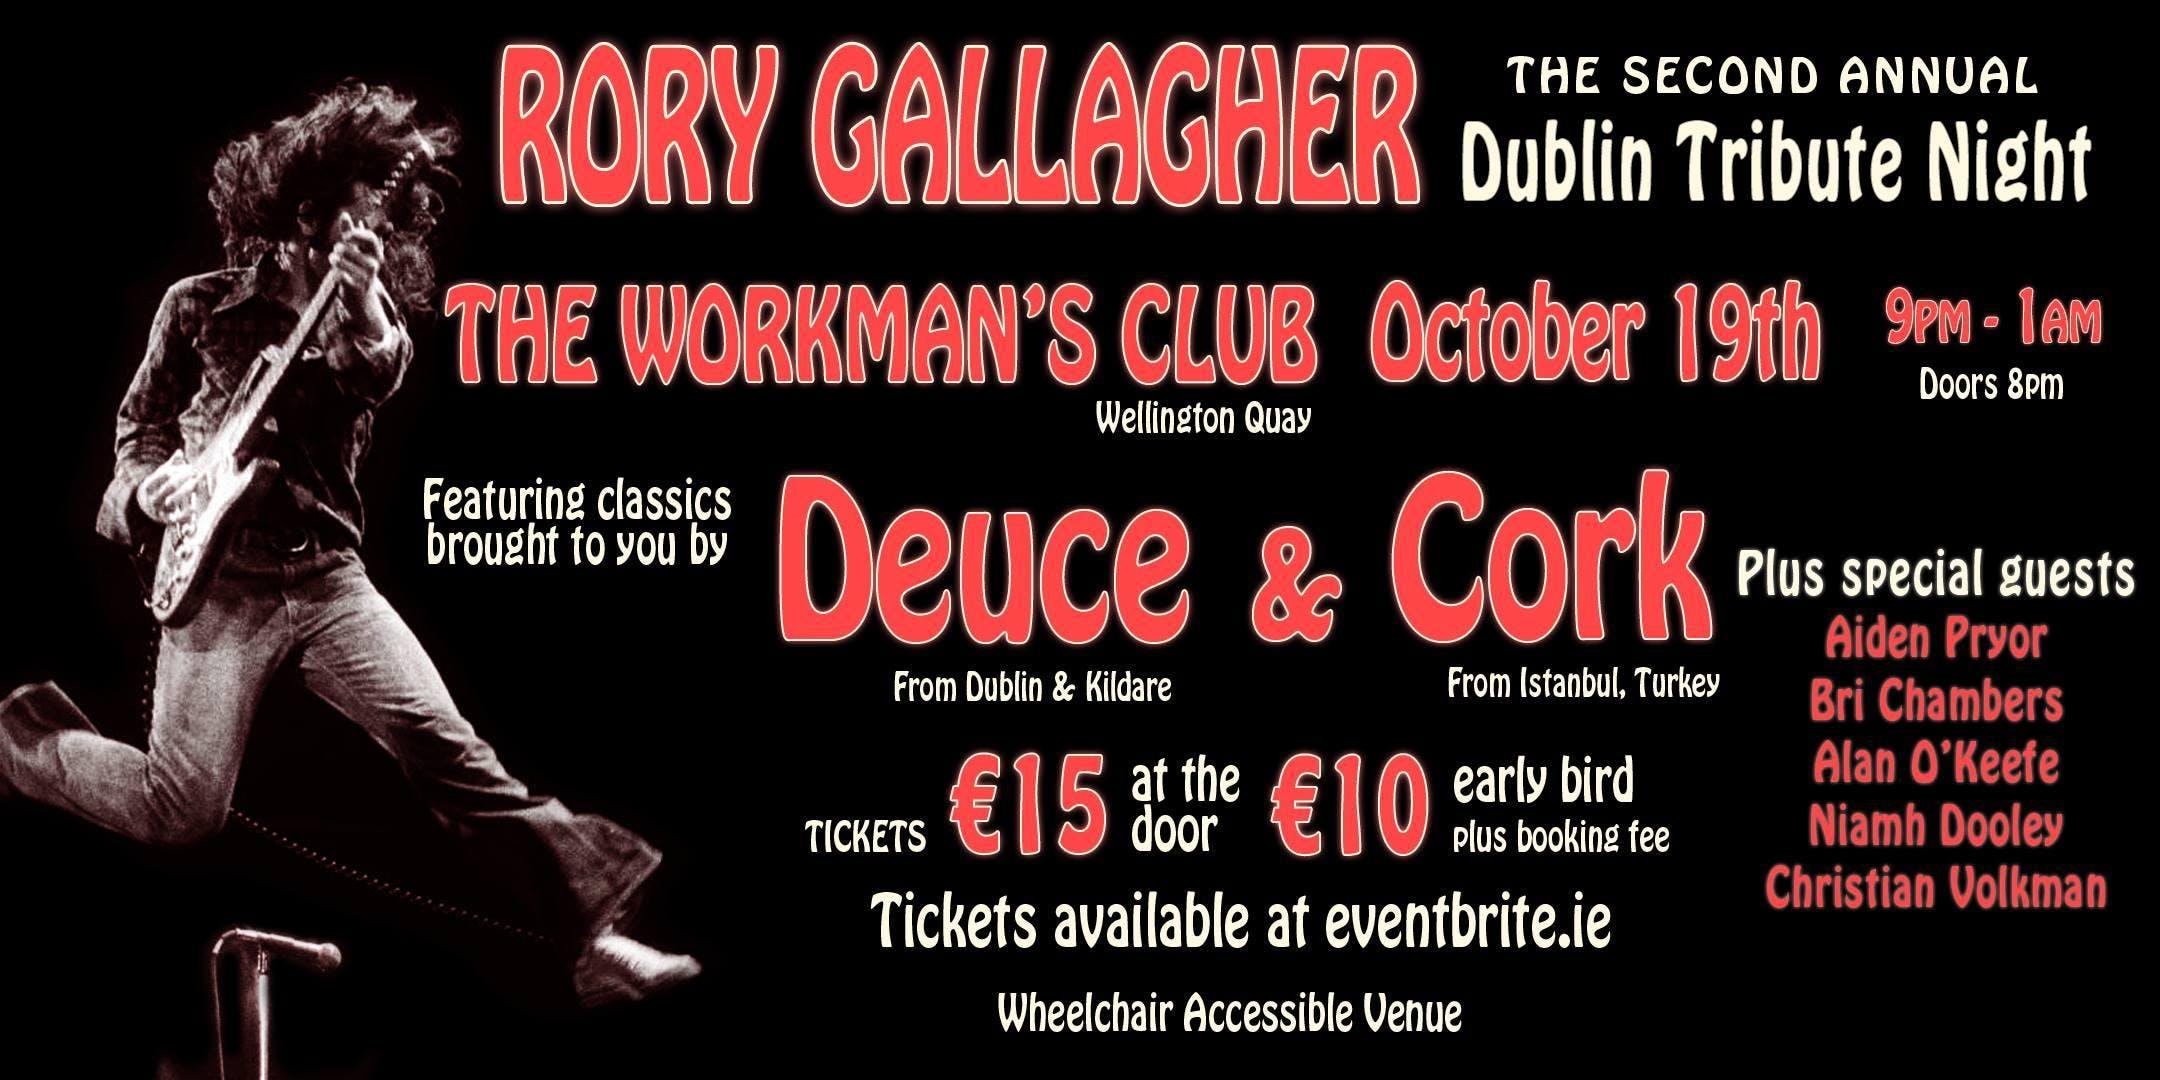 Rory Gallagher Dublin Tribute Night